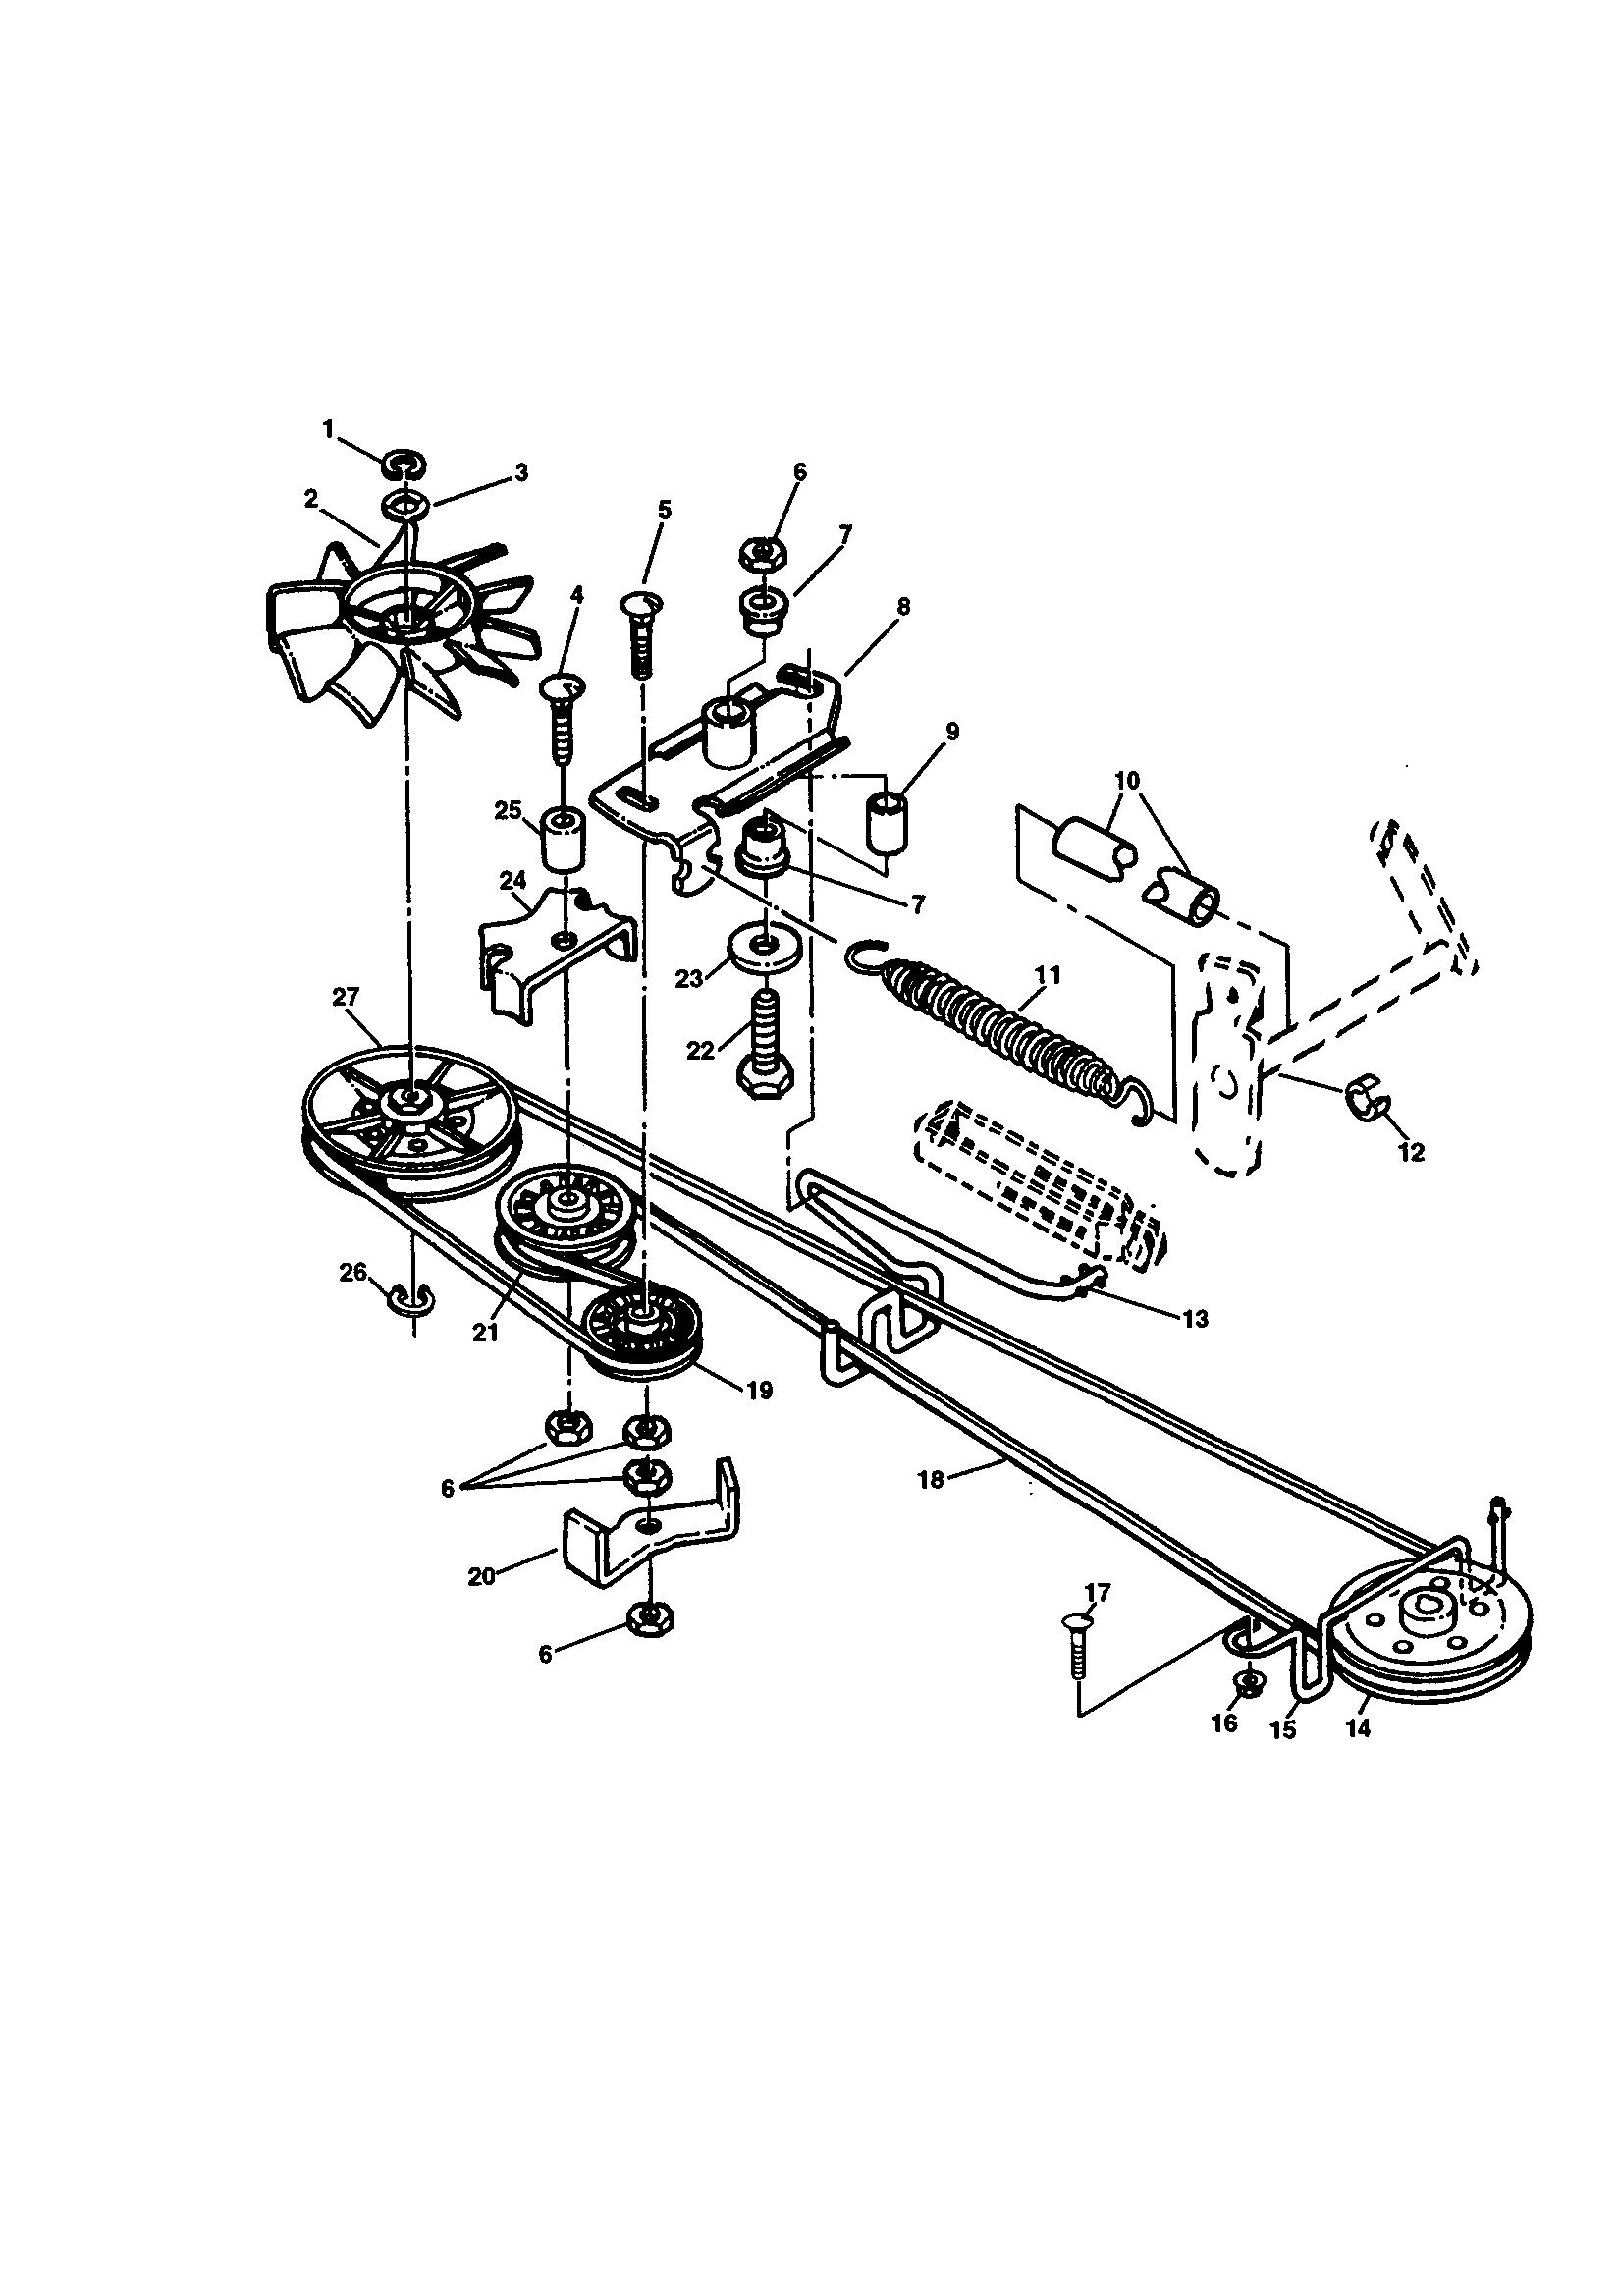 john deere saber wiring diagram ford falcon eb radio sabre mower deck